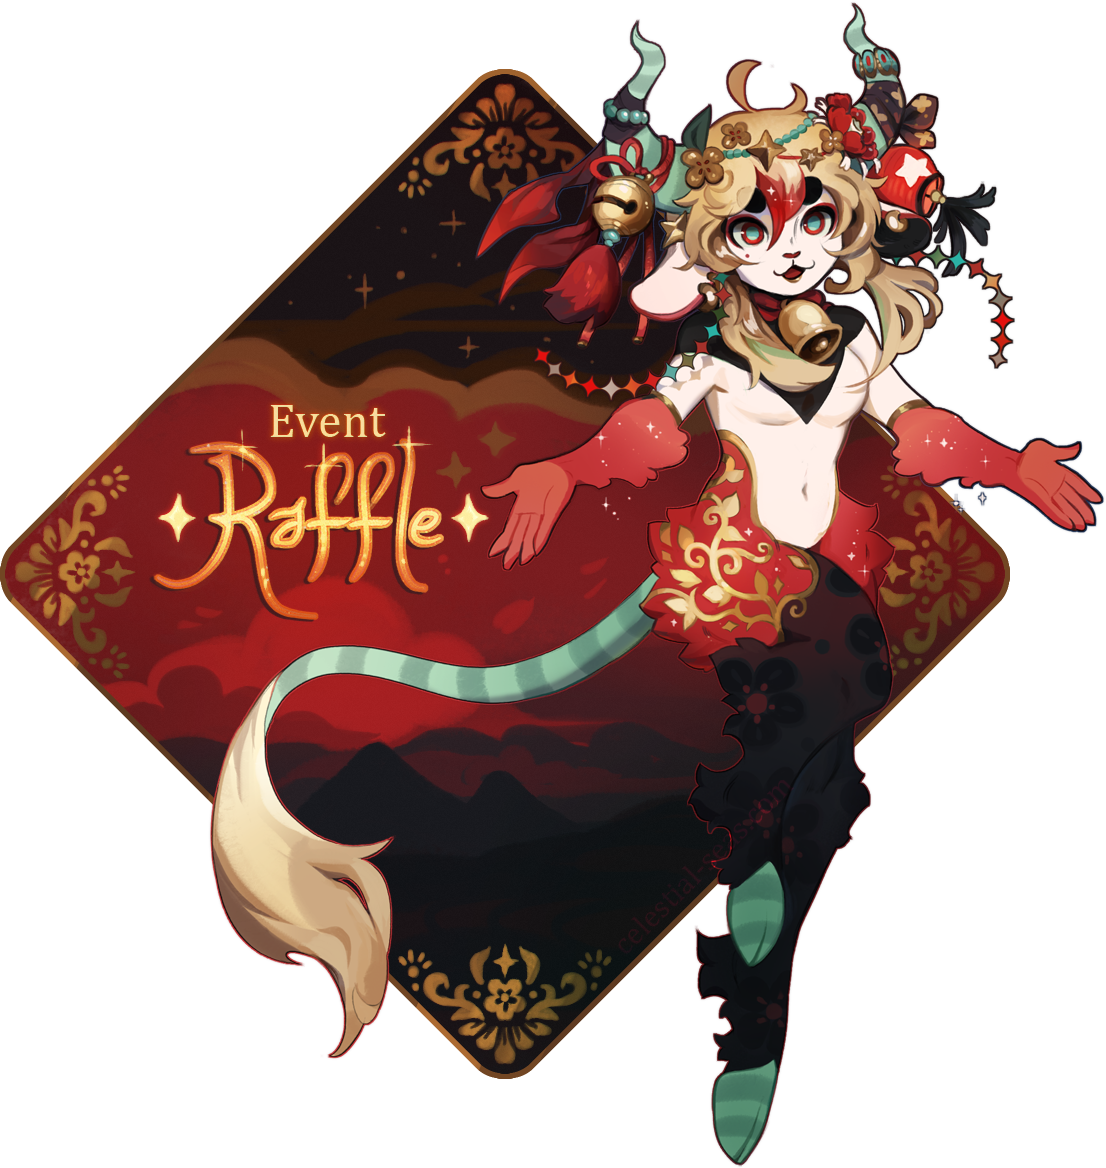 Raffle Satyr by Browbird